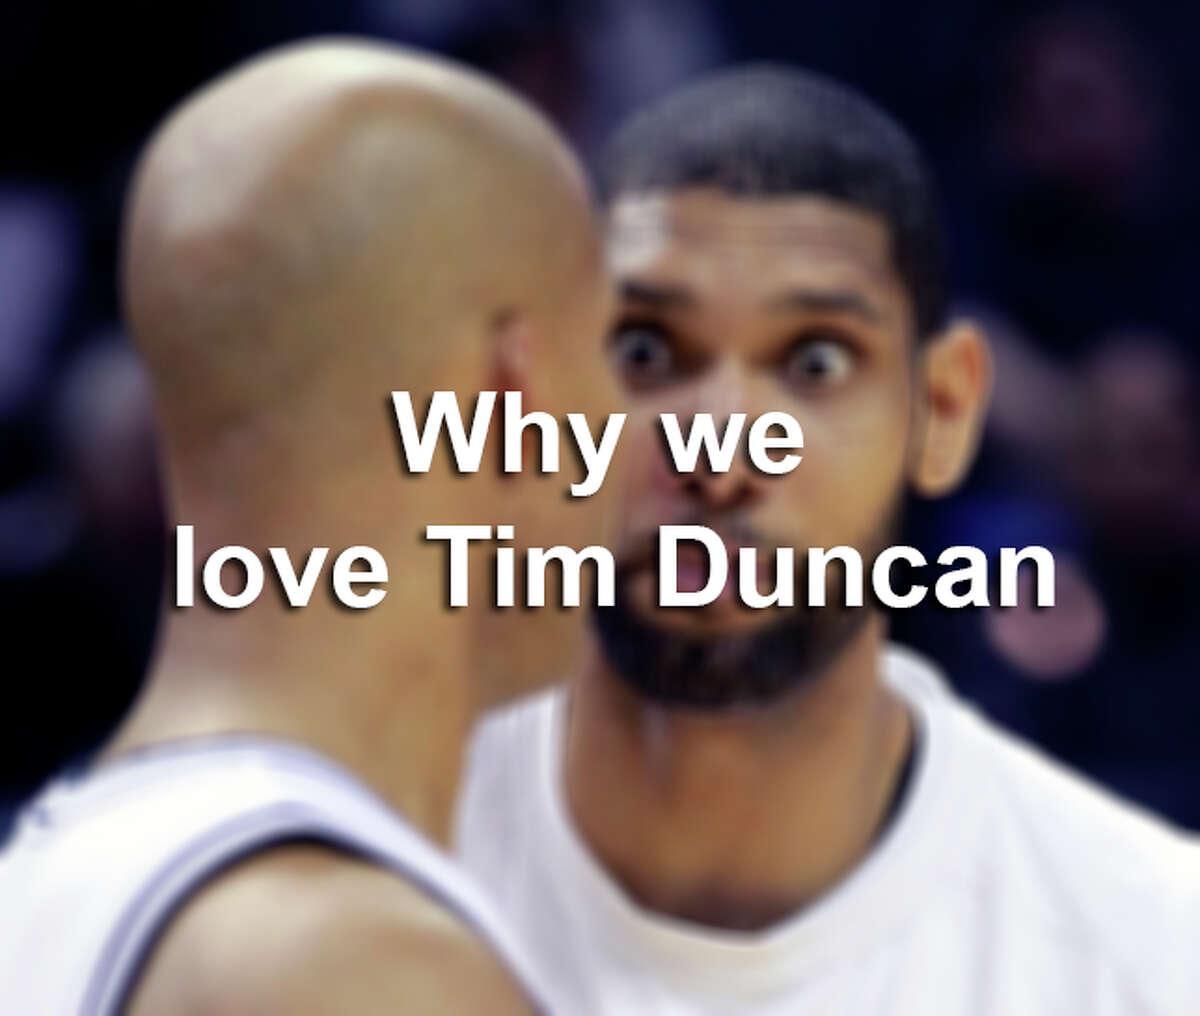 Why we love Tim Duncan